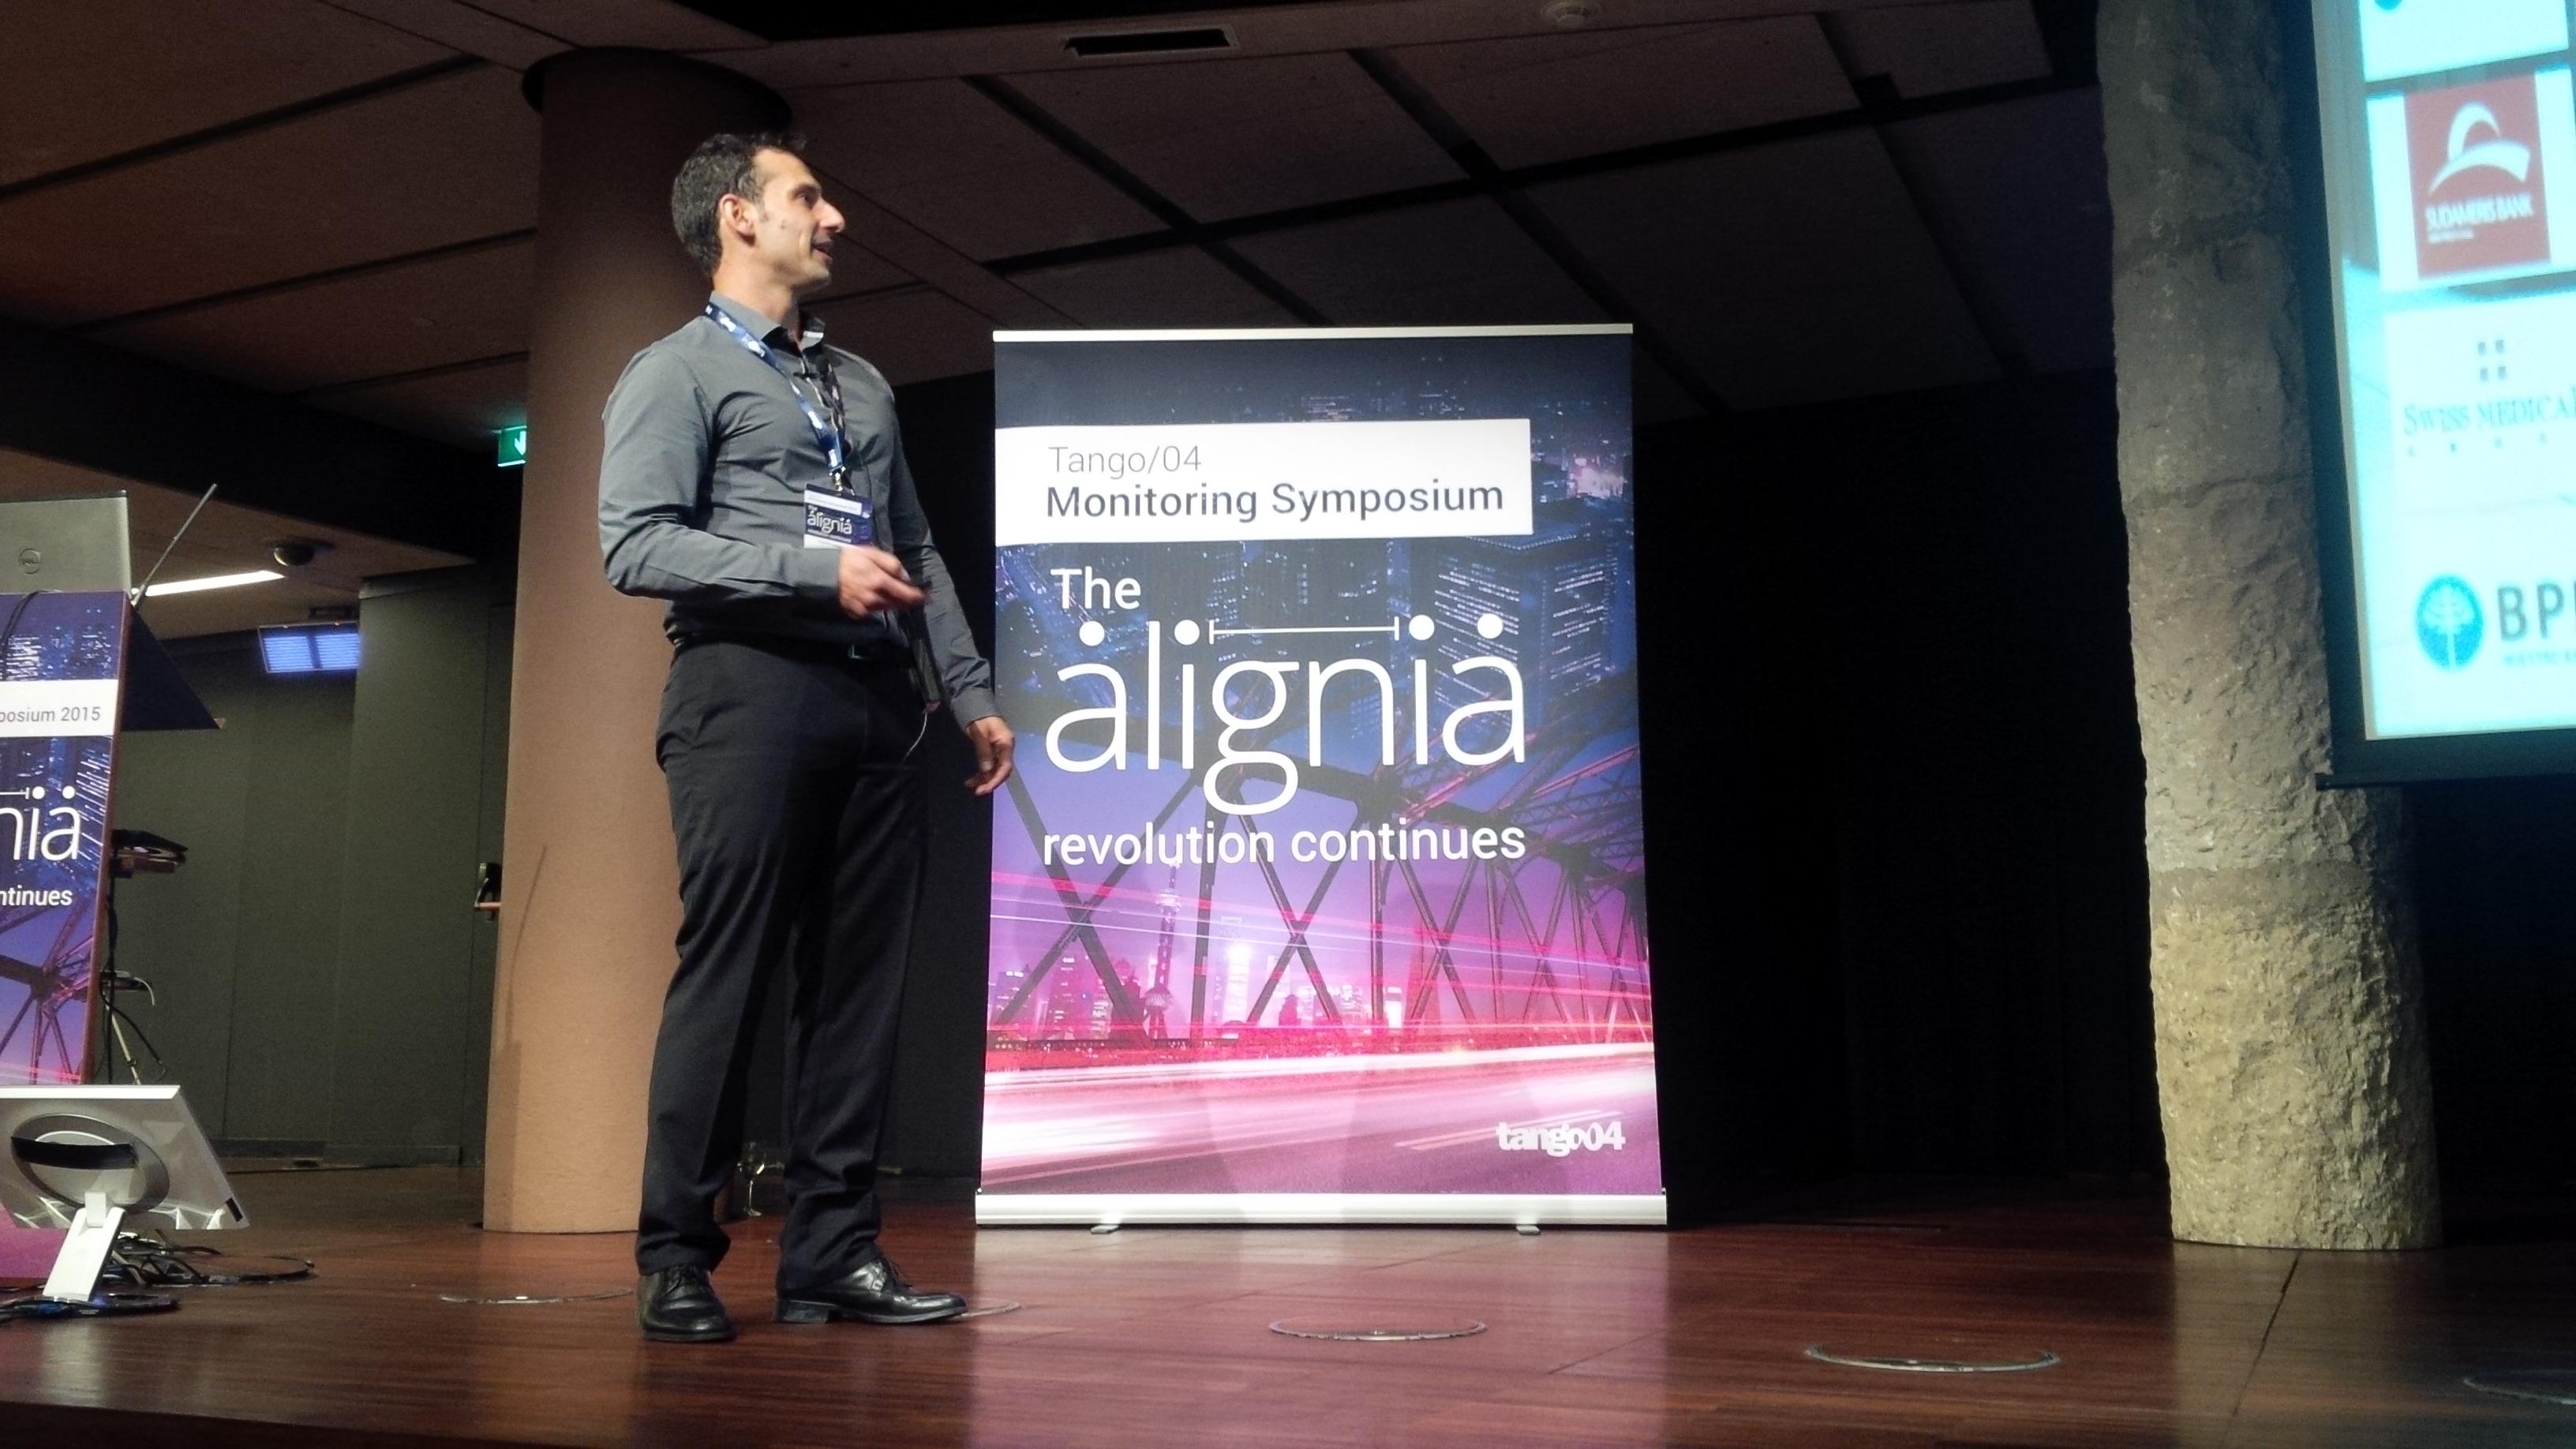 Monitoring symposium TANGO 7